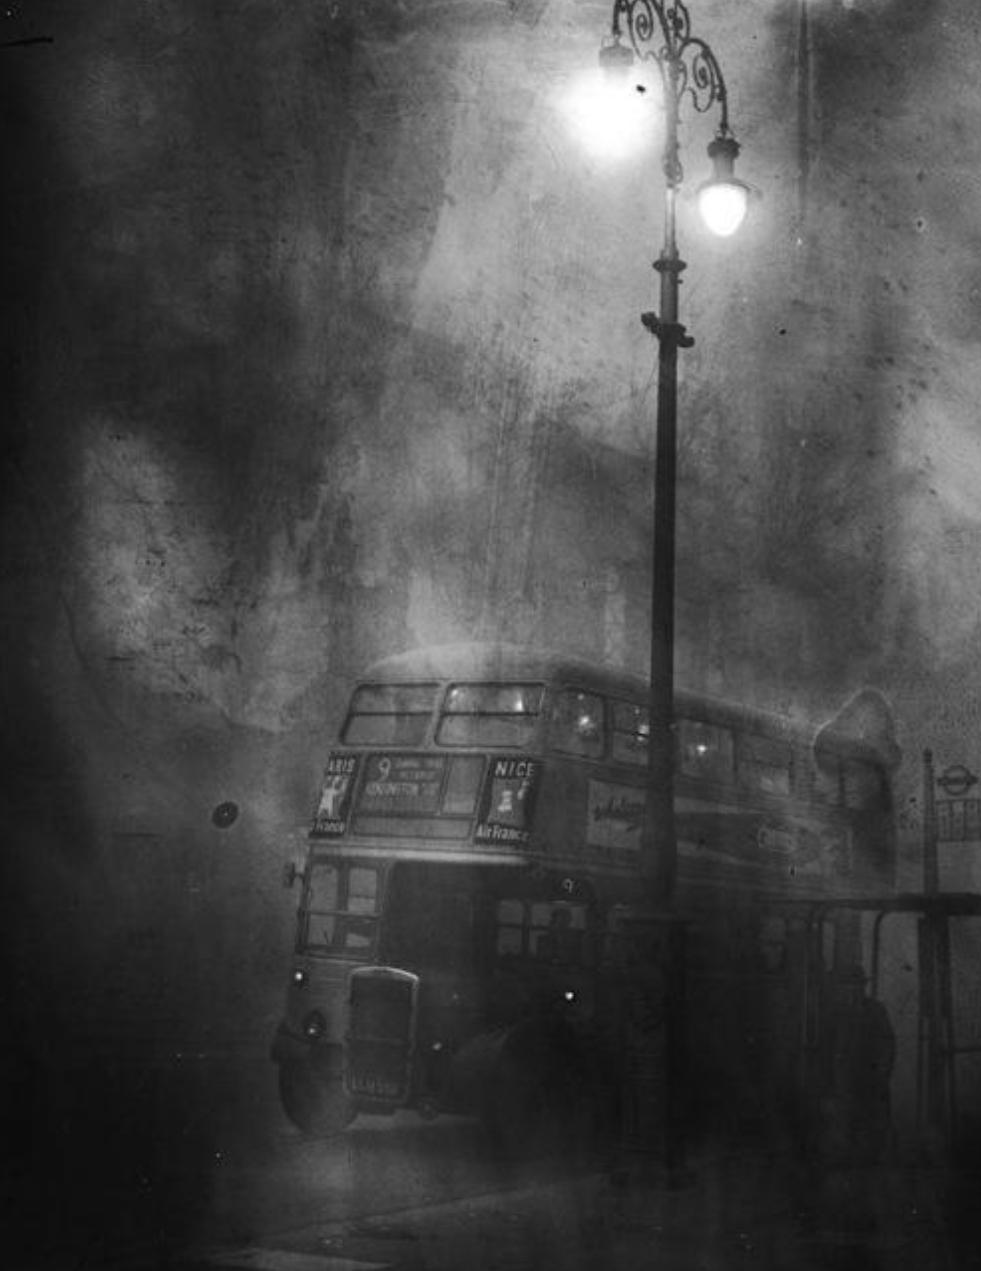 داستان دنباله دار زیبای اتوبوس شبرو بخش 2